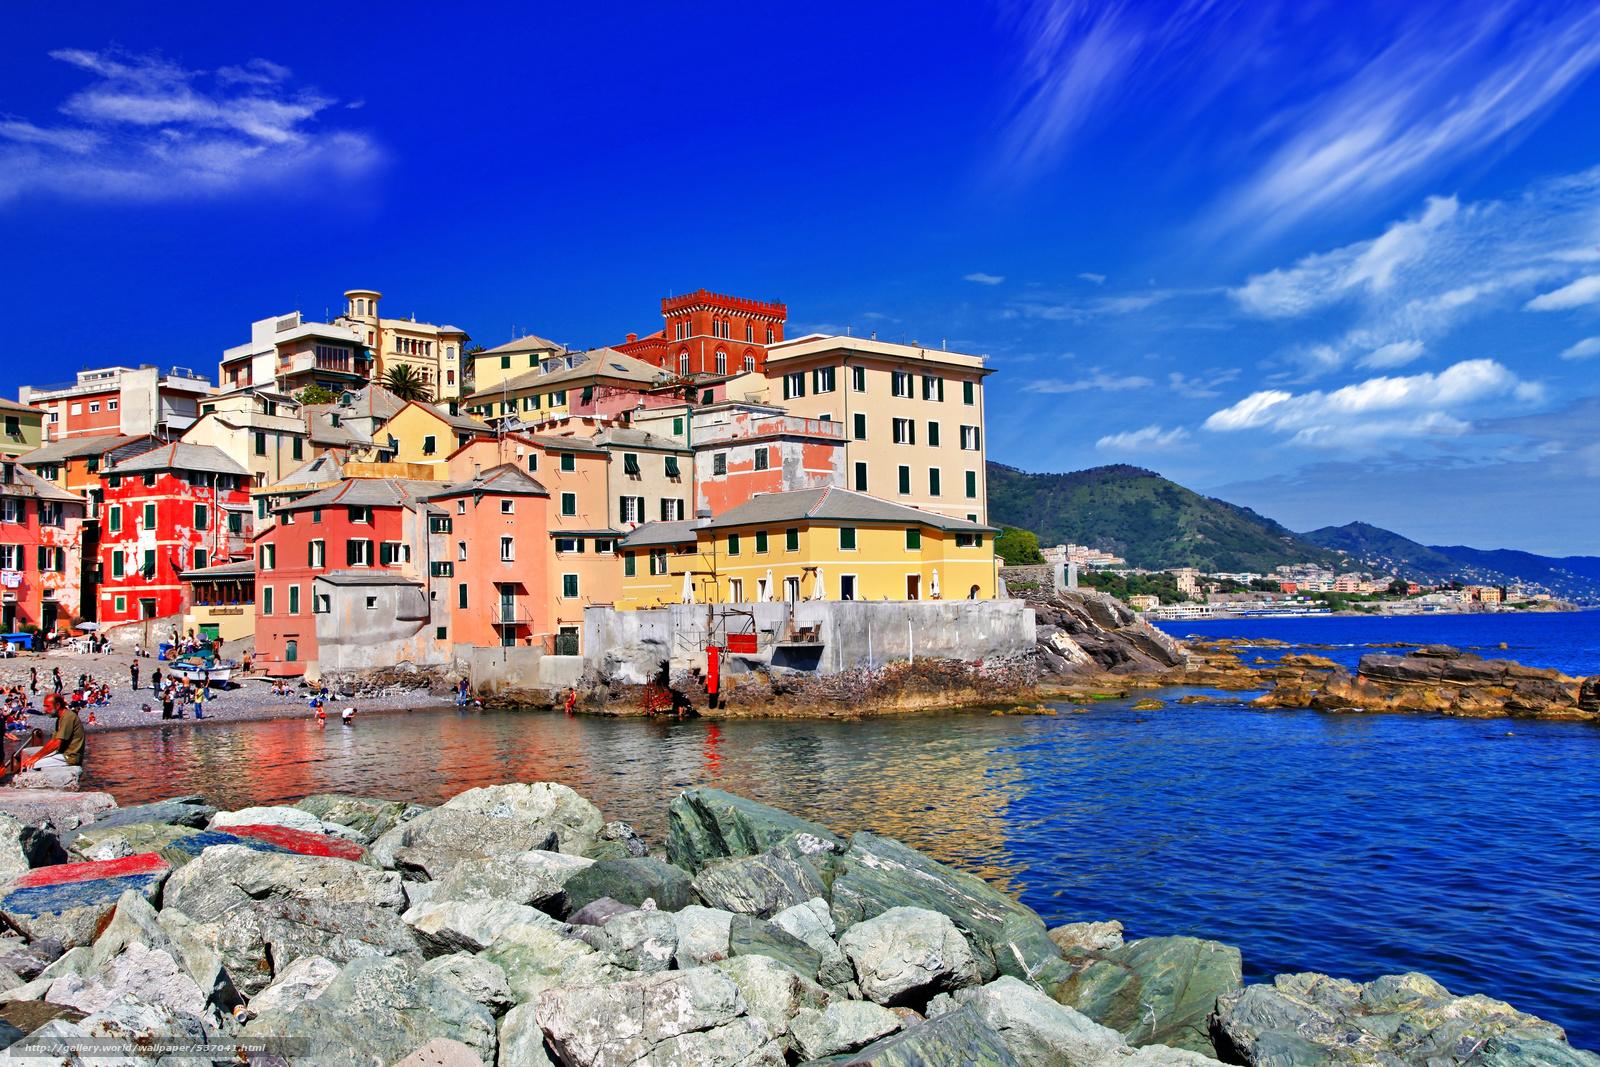 Download wallpaper Genova Liguria Italy desktop wallpaper in 1600x1067